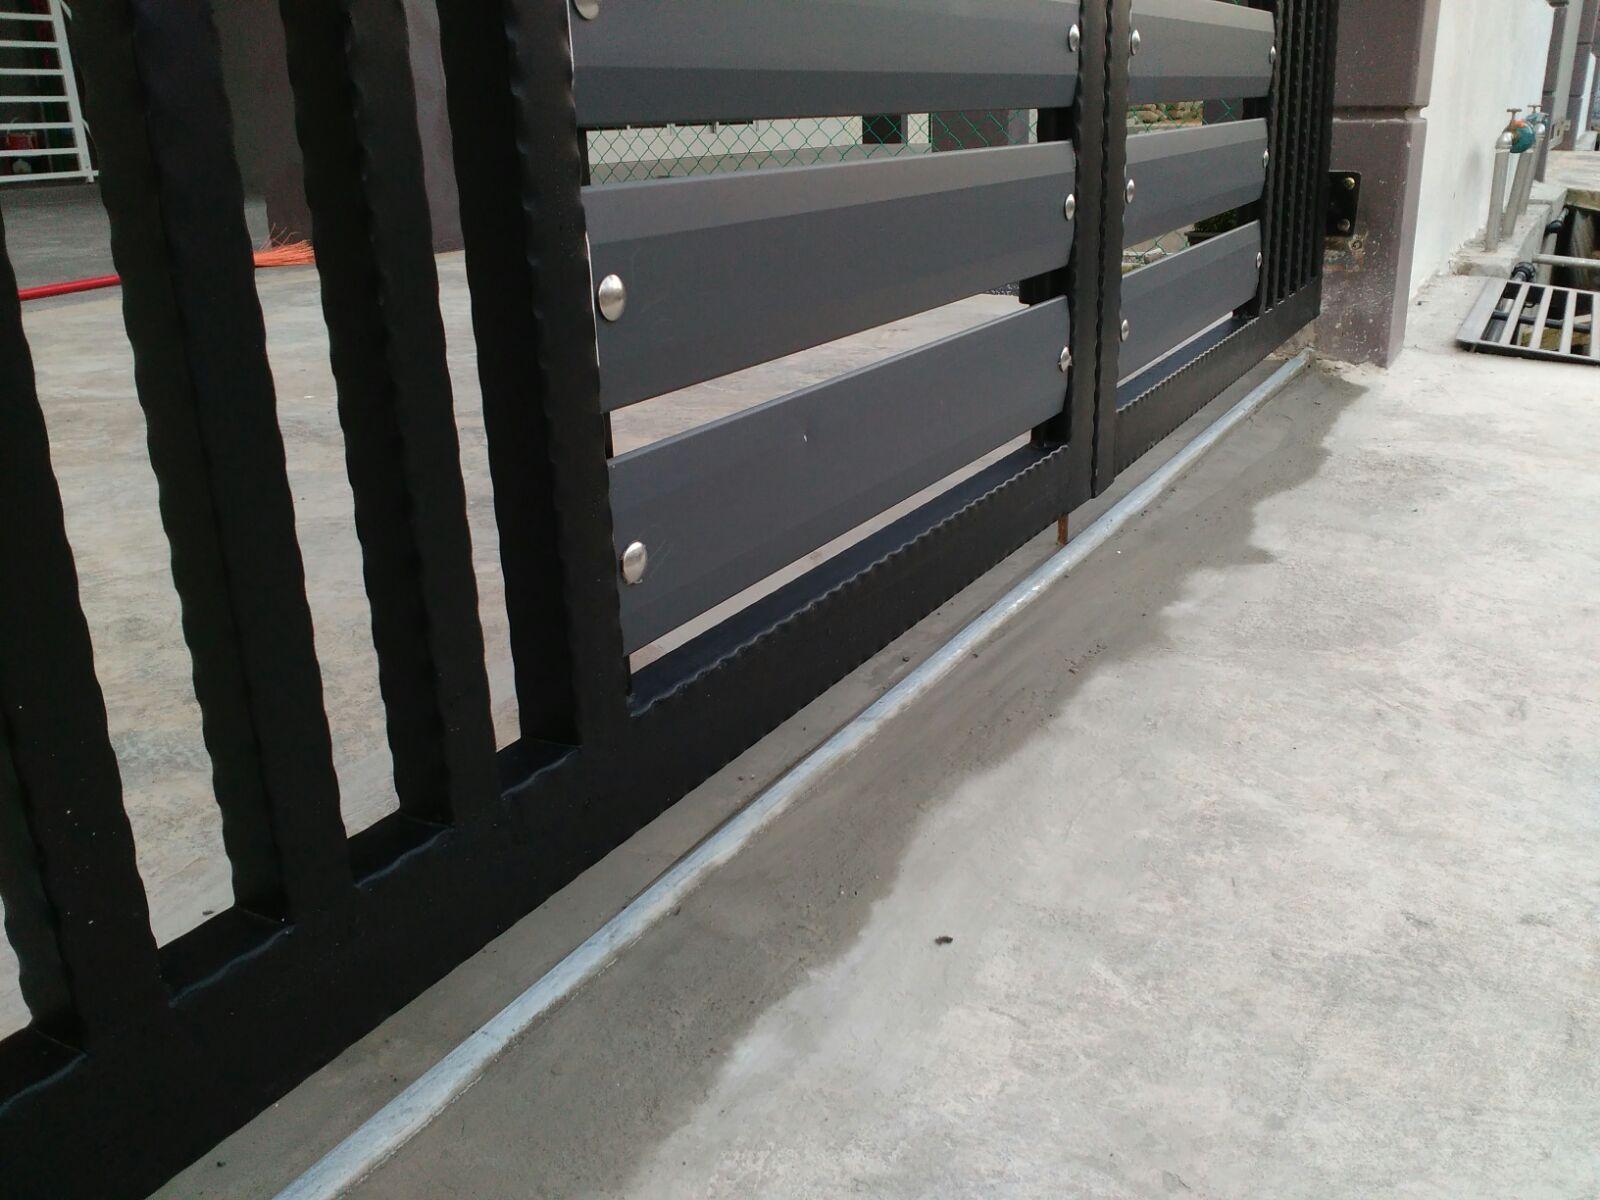 Jenis-Jenis Besi Untuk Membuat Pintu Pagar & Pintu Jeriji